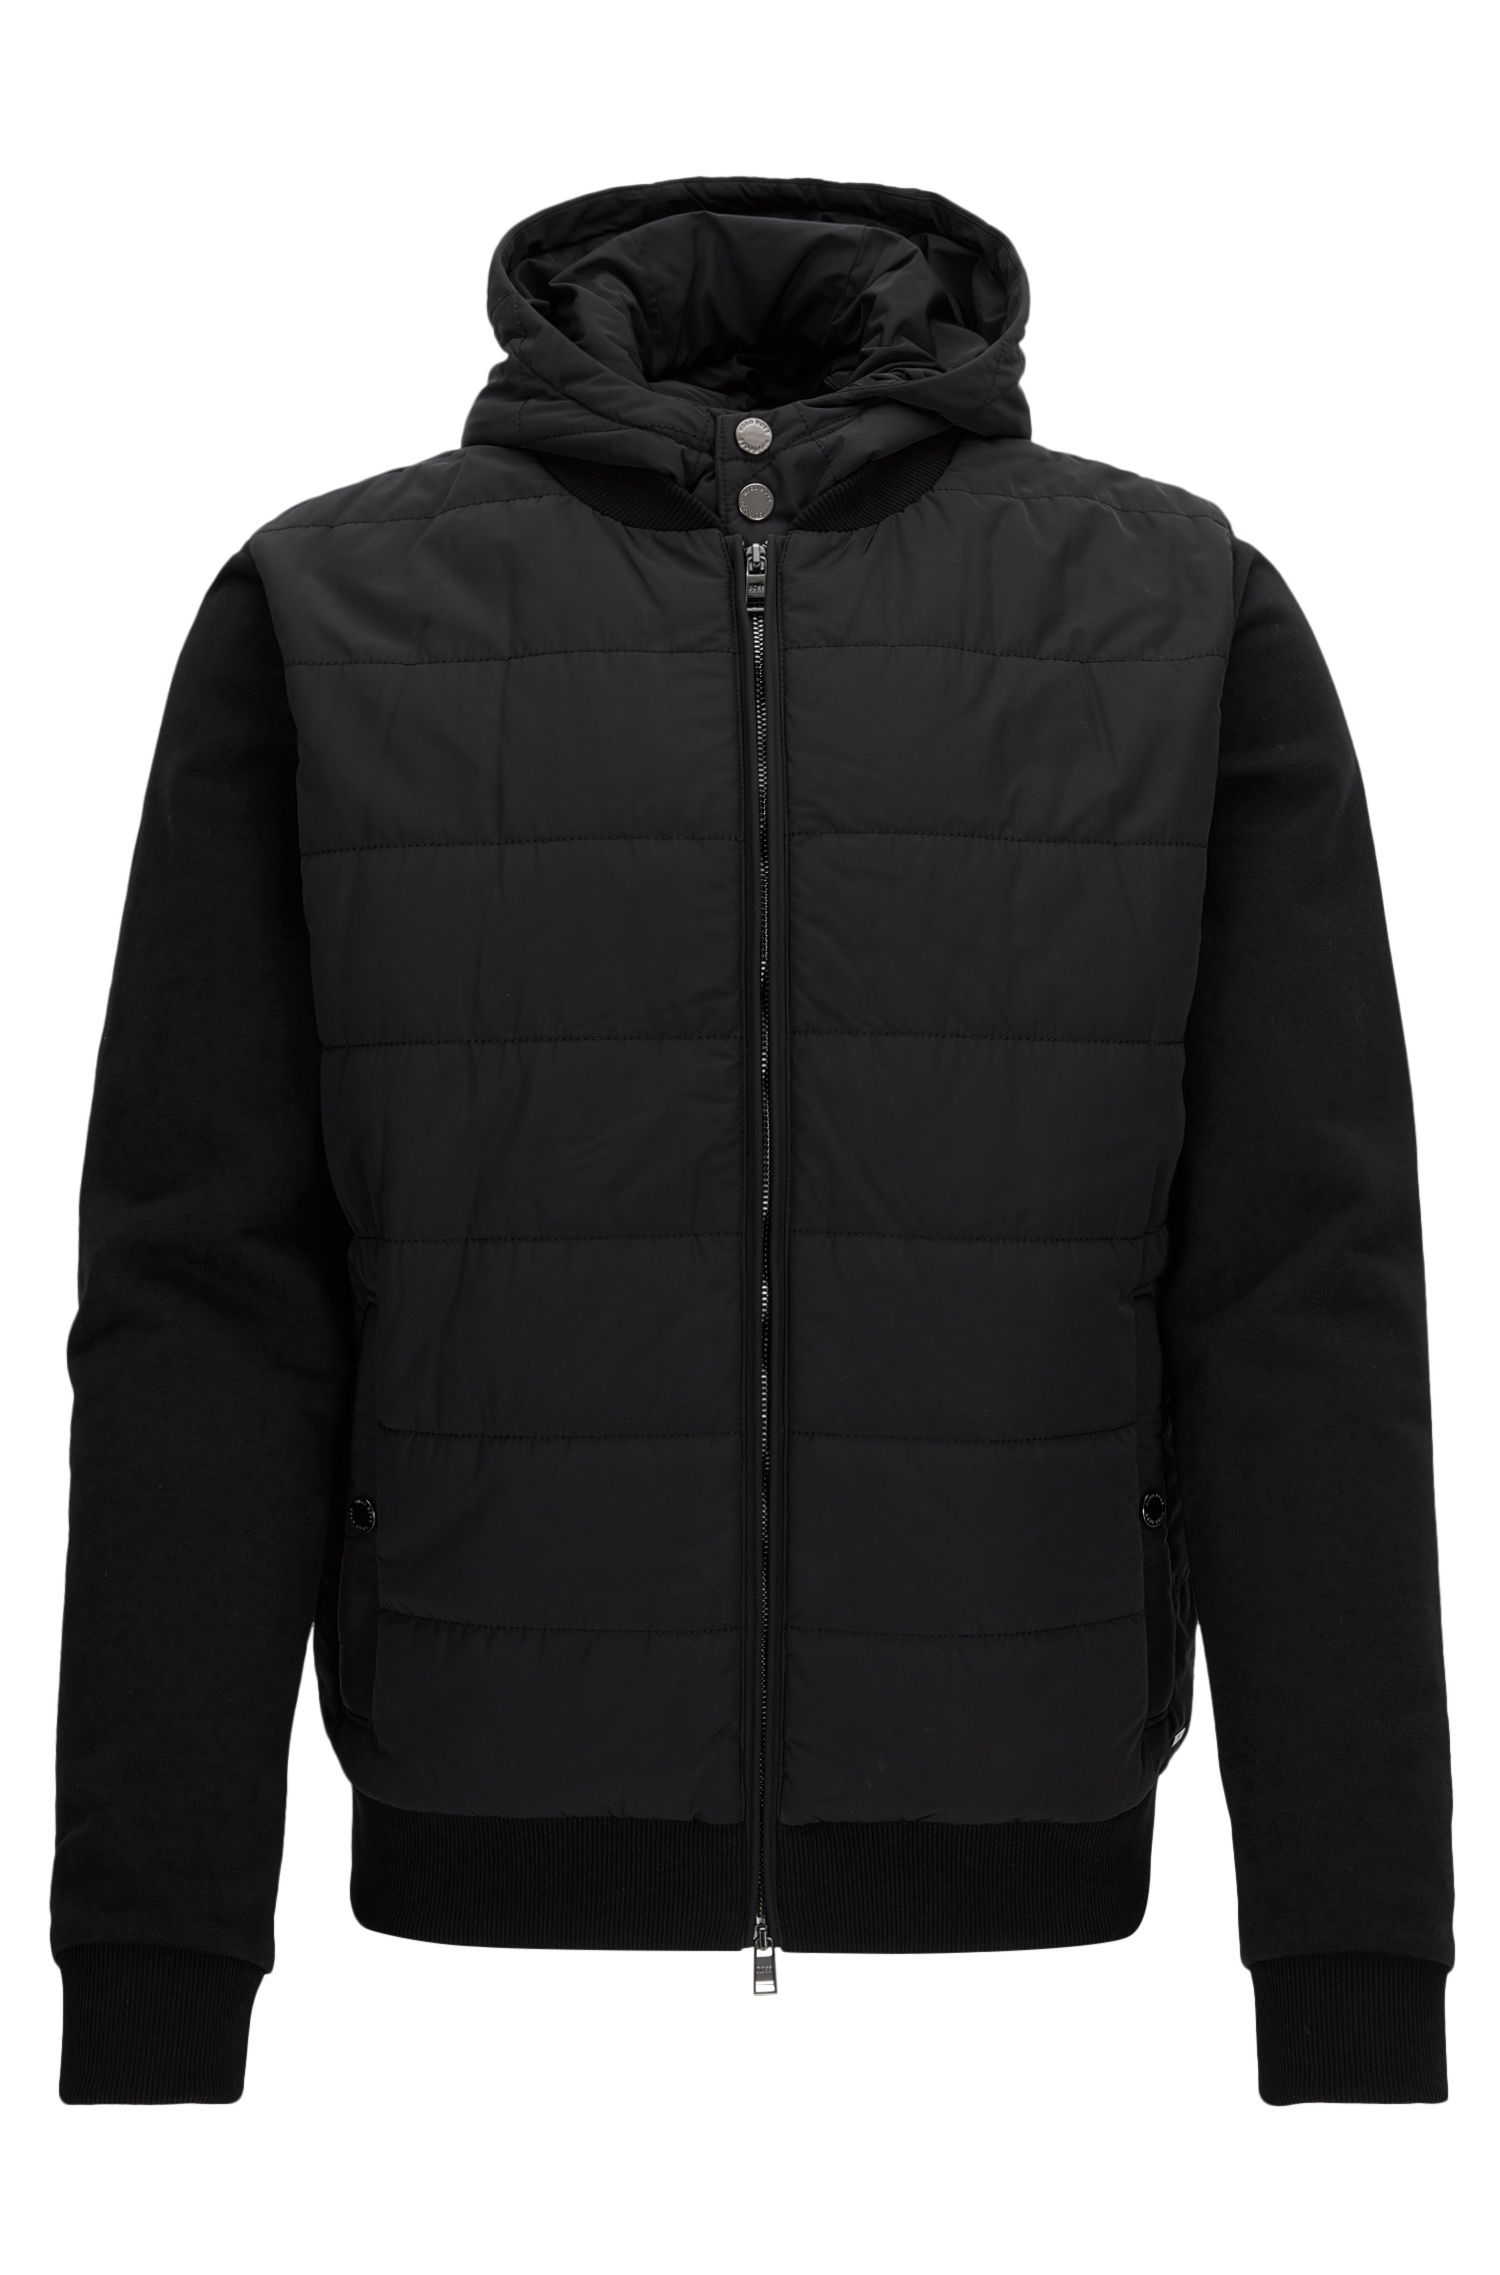 'Skiles' | Nylon Zip Jacket, Black